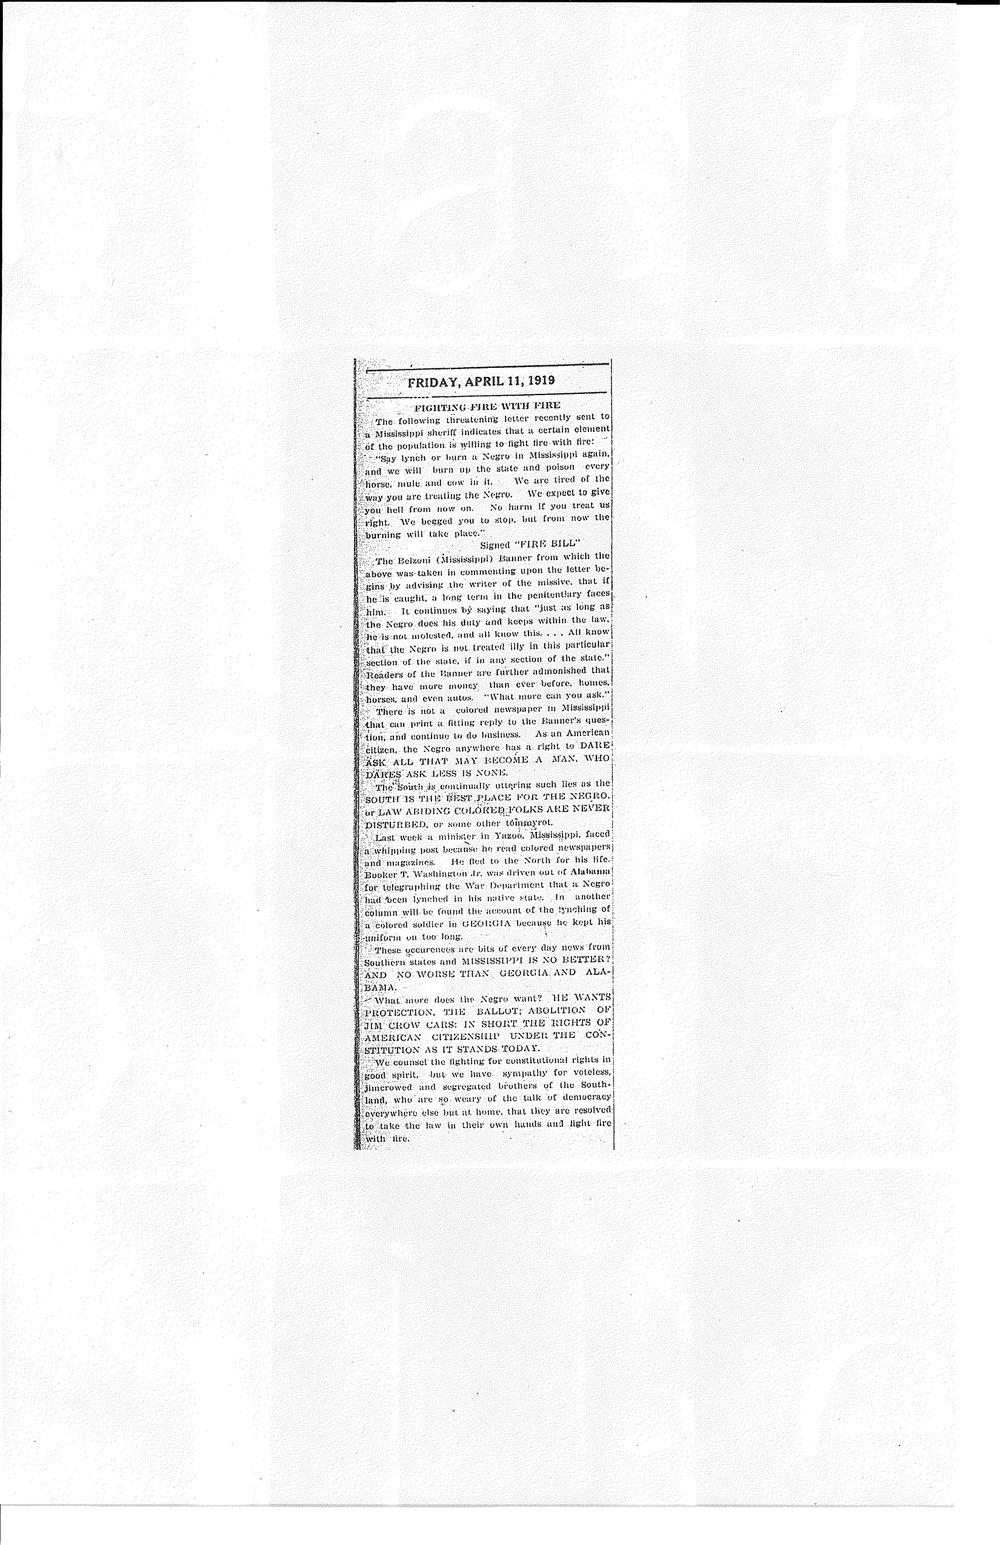 fire bill page 2.jpg